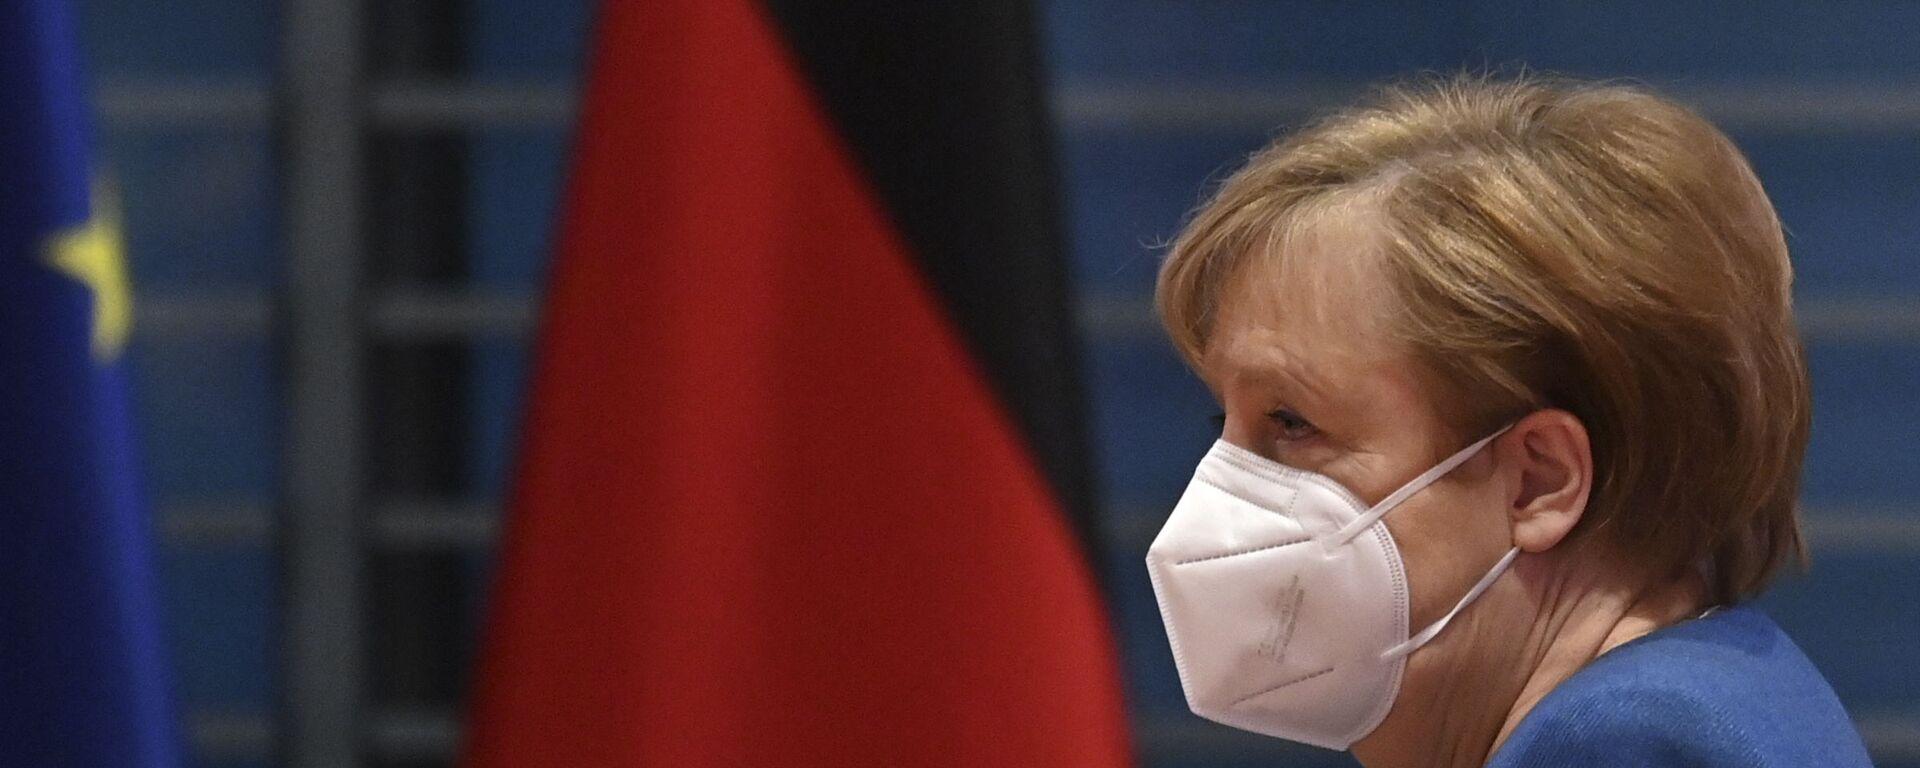 Kanclerz Niemiec Angela Merkel. - Sputnik Polska, 1920, 12.09.2021